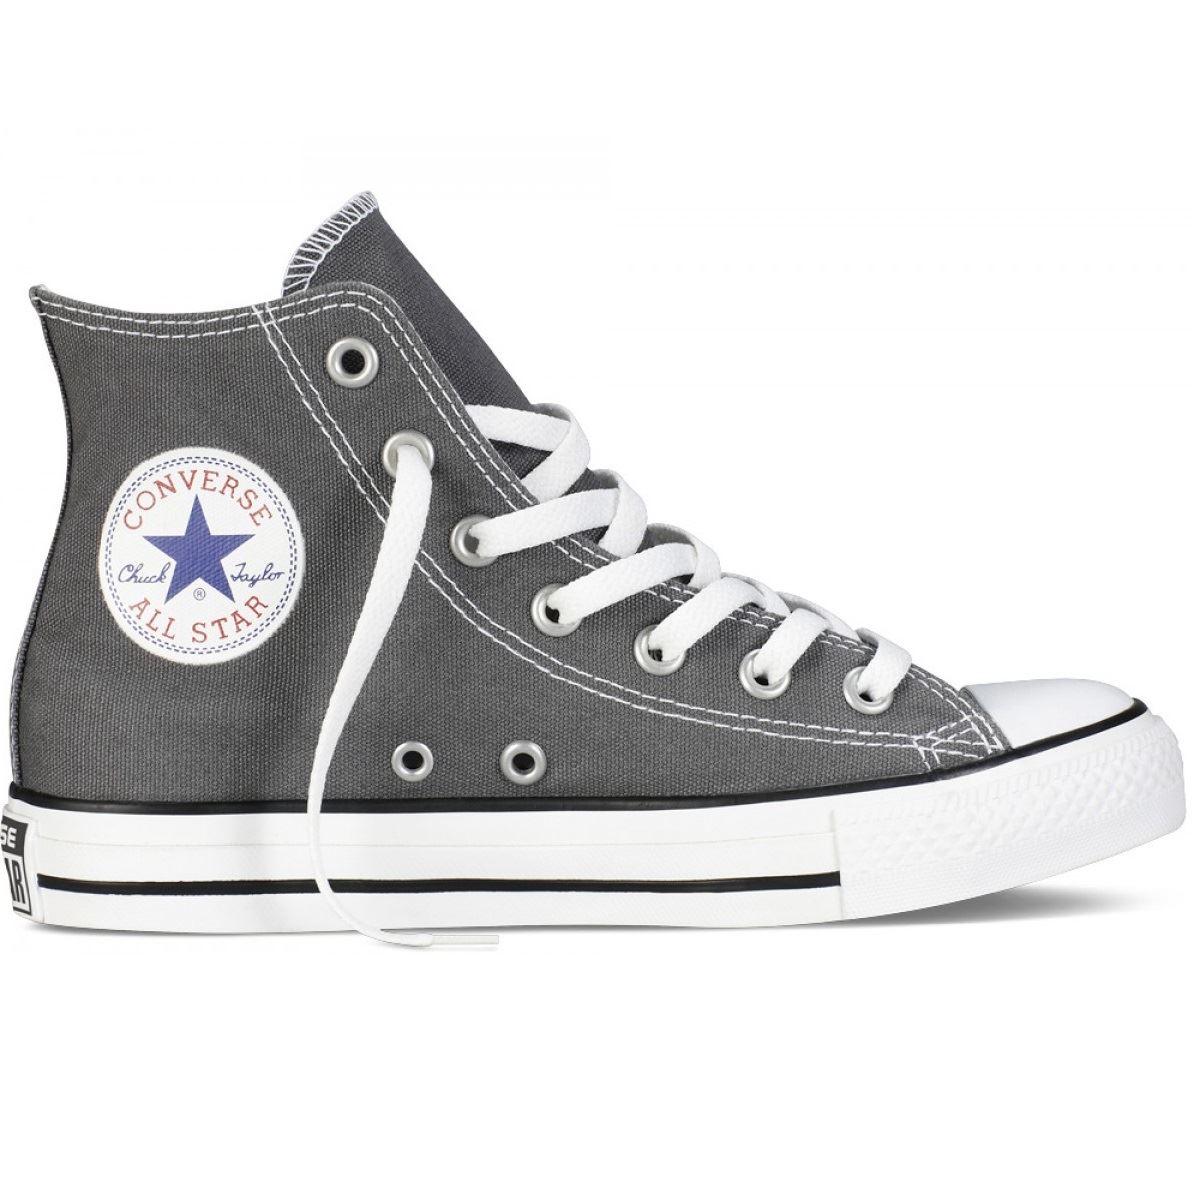 grey and black converse high tops \u003e Up